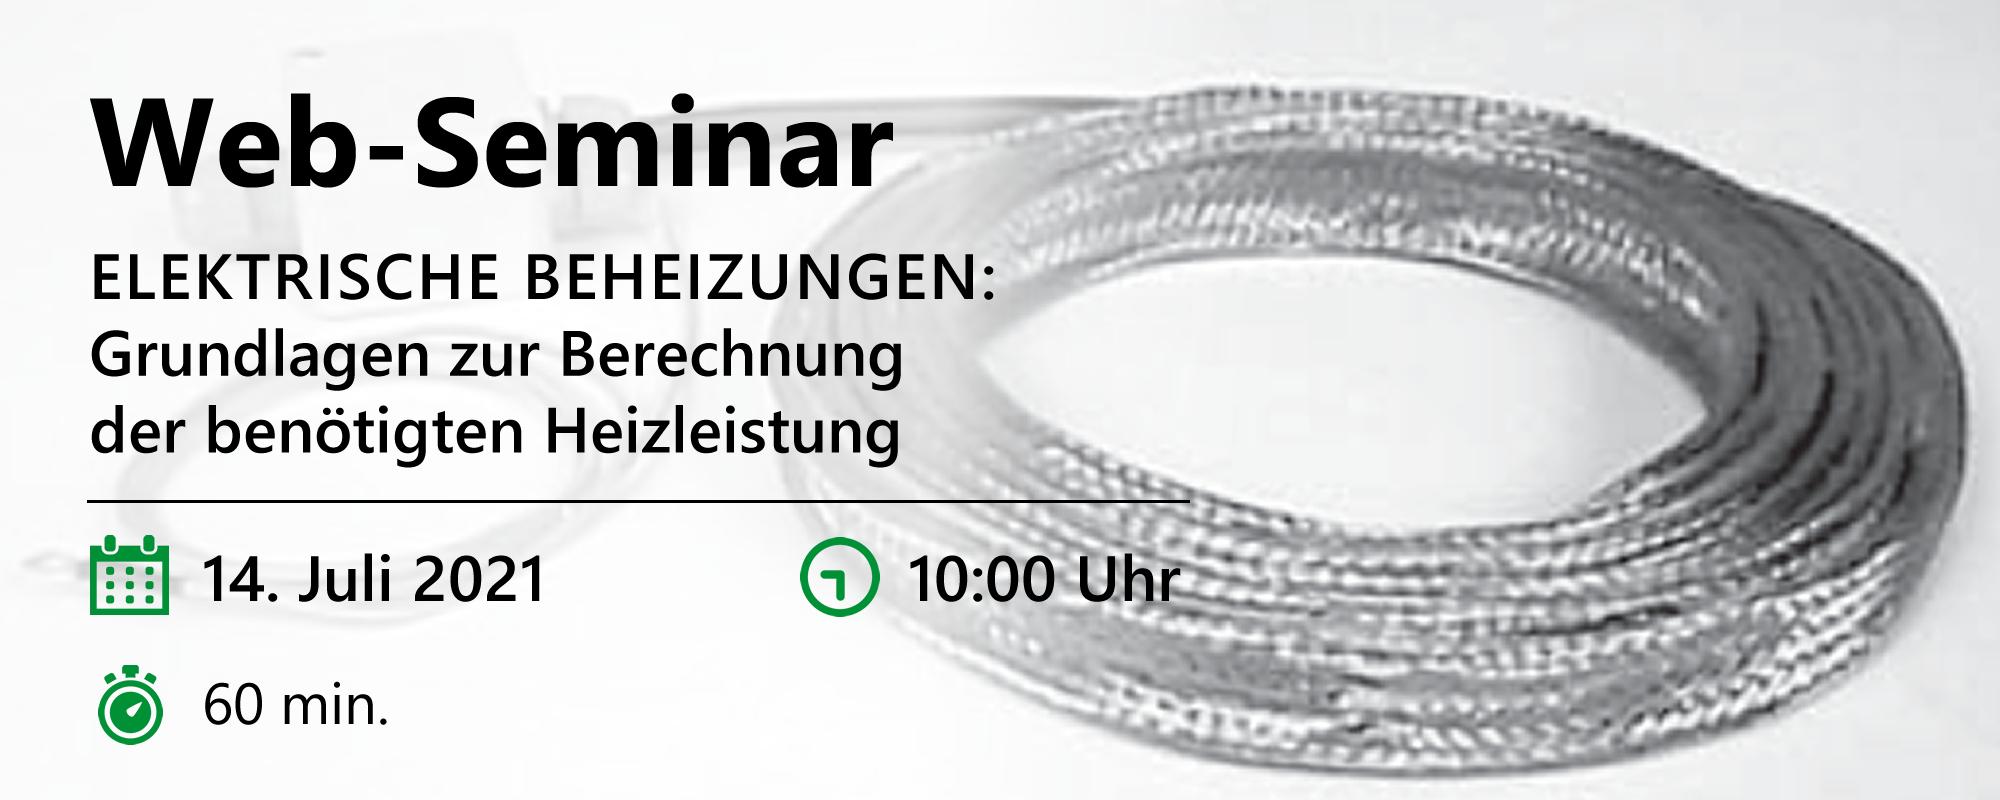 Web-Seminar am 14.07.2021